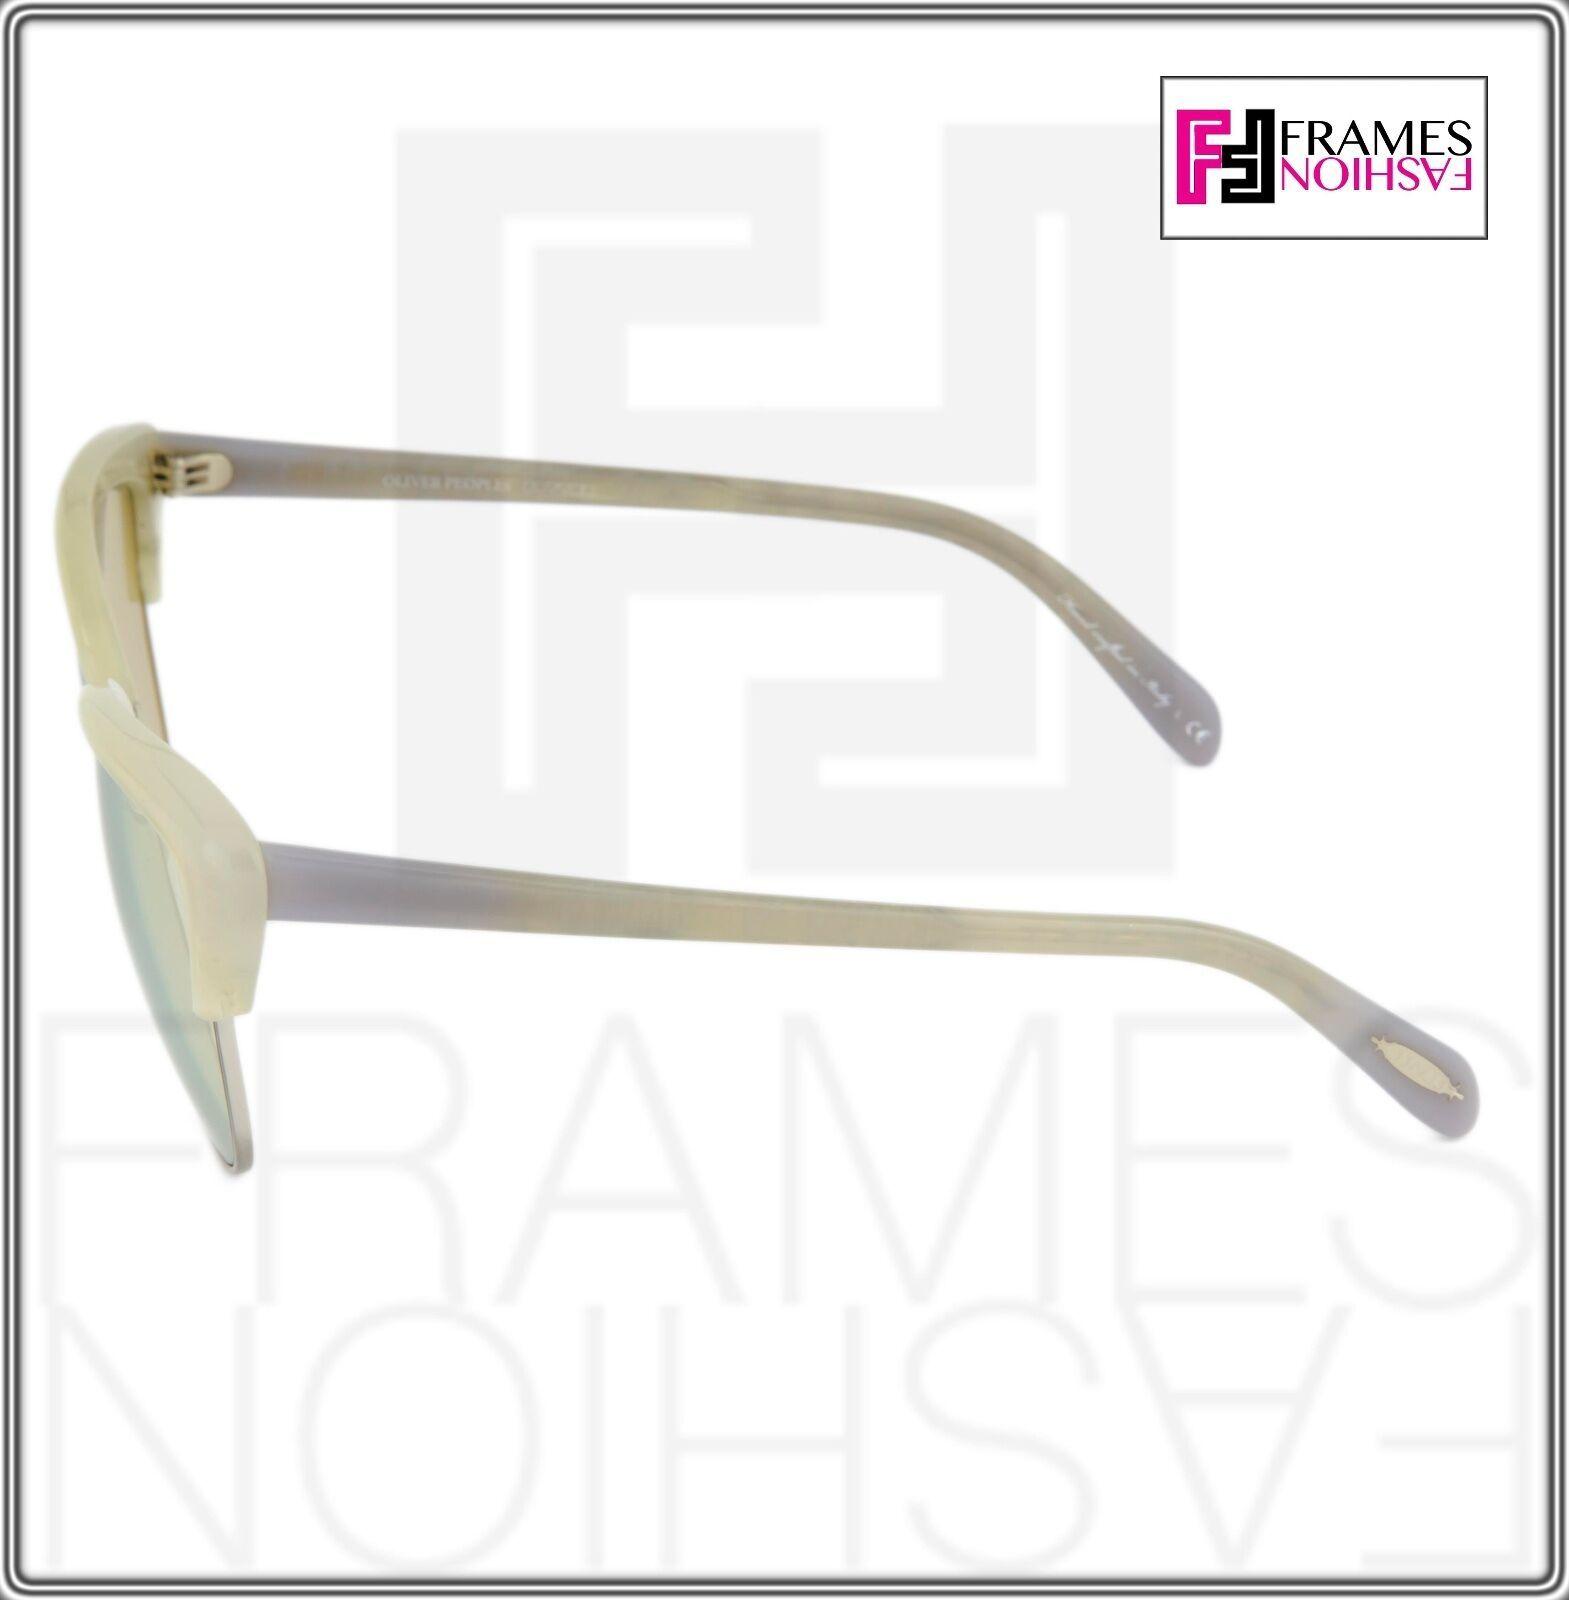 OLIVER PEOPLES ALISHA OV5244S White Pearl Flash Mirrored Sunglasses 5244 Women image 4